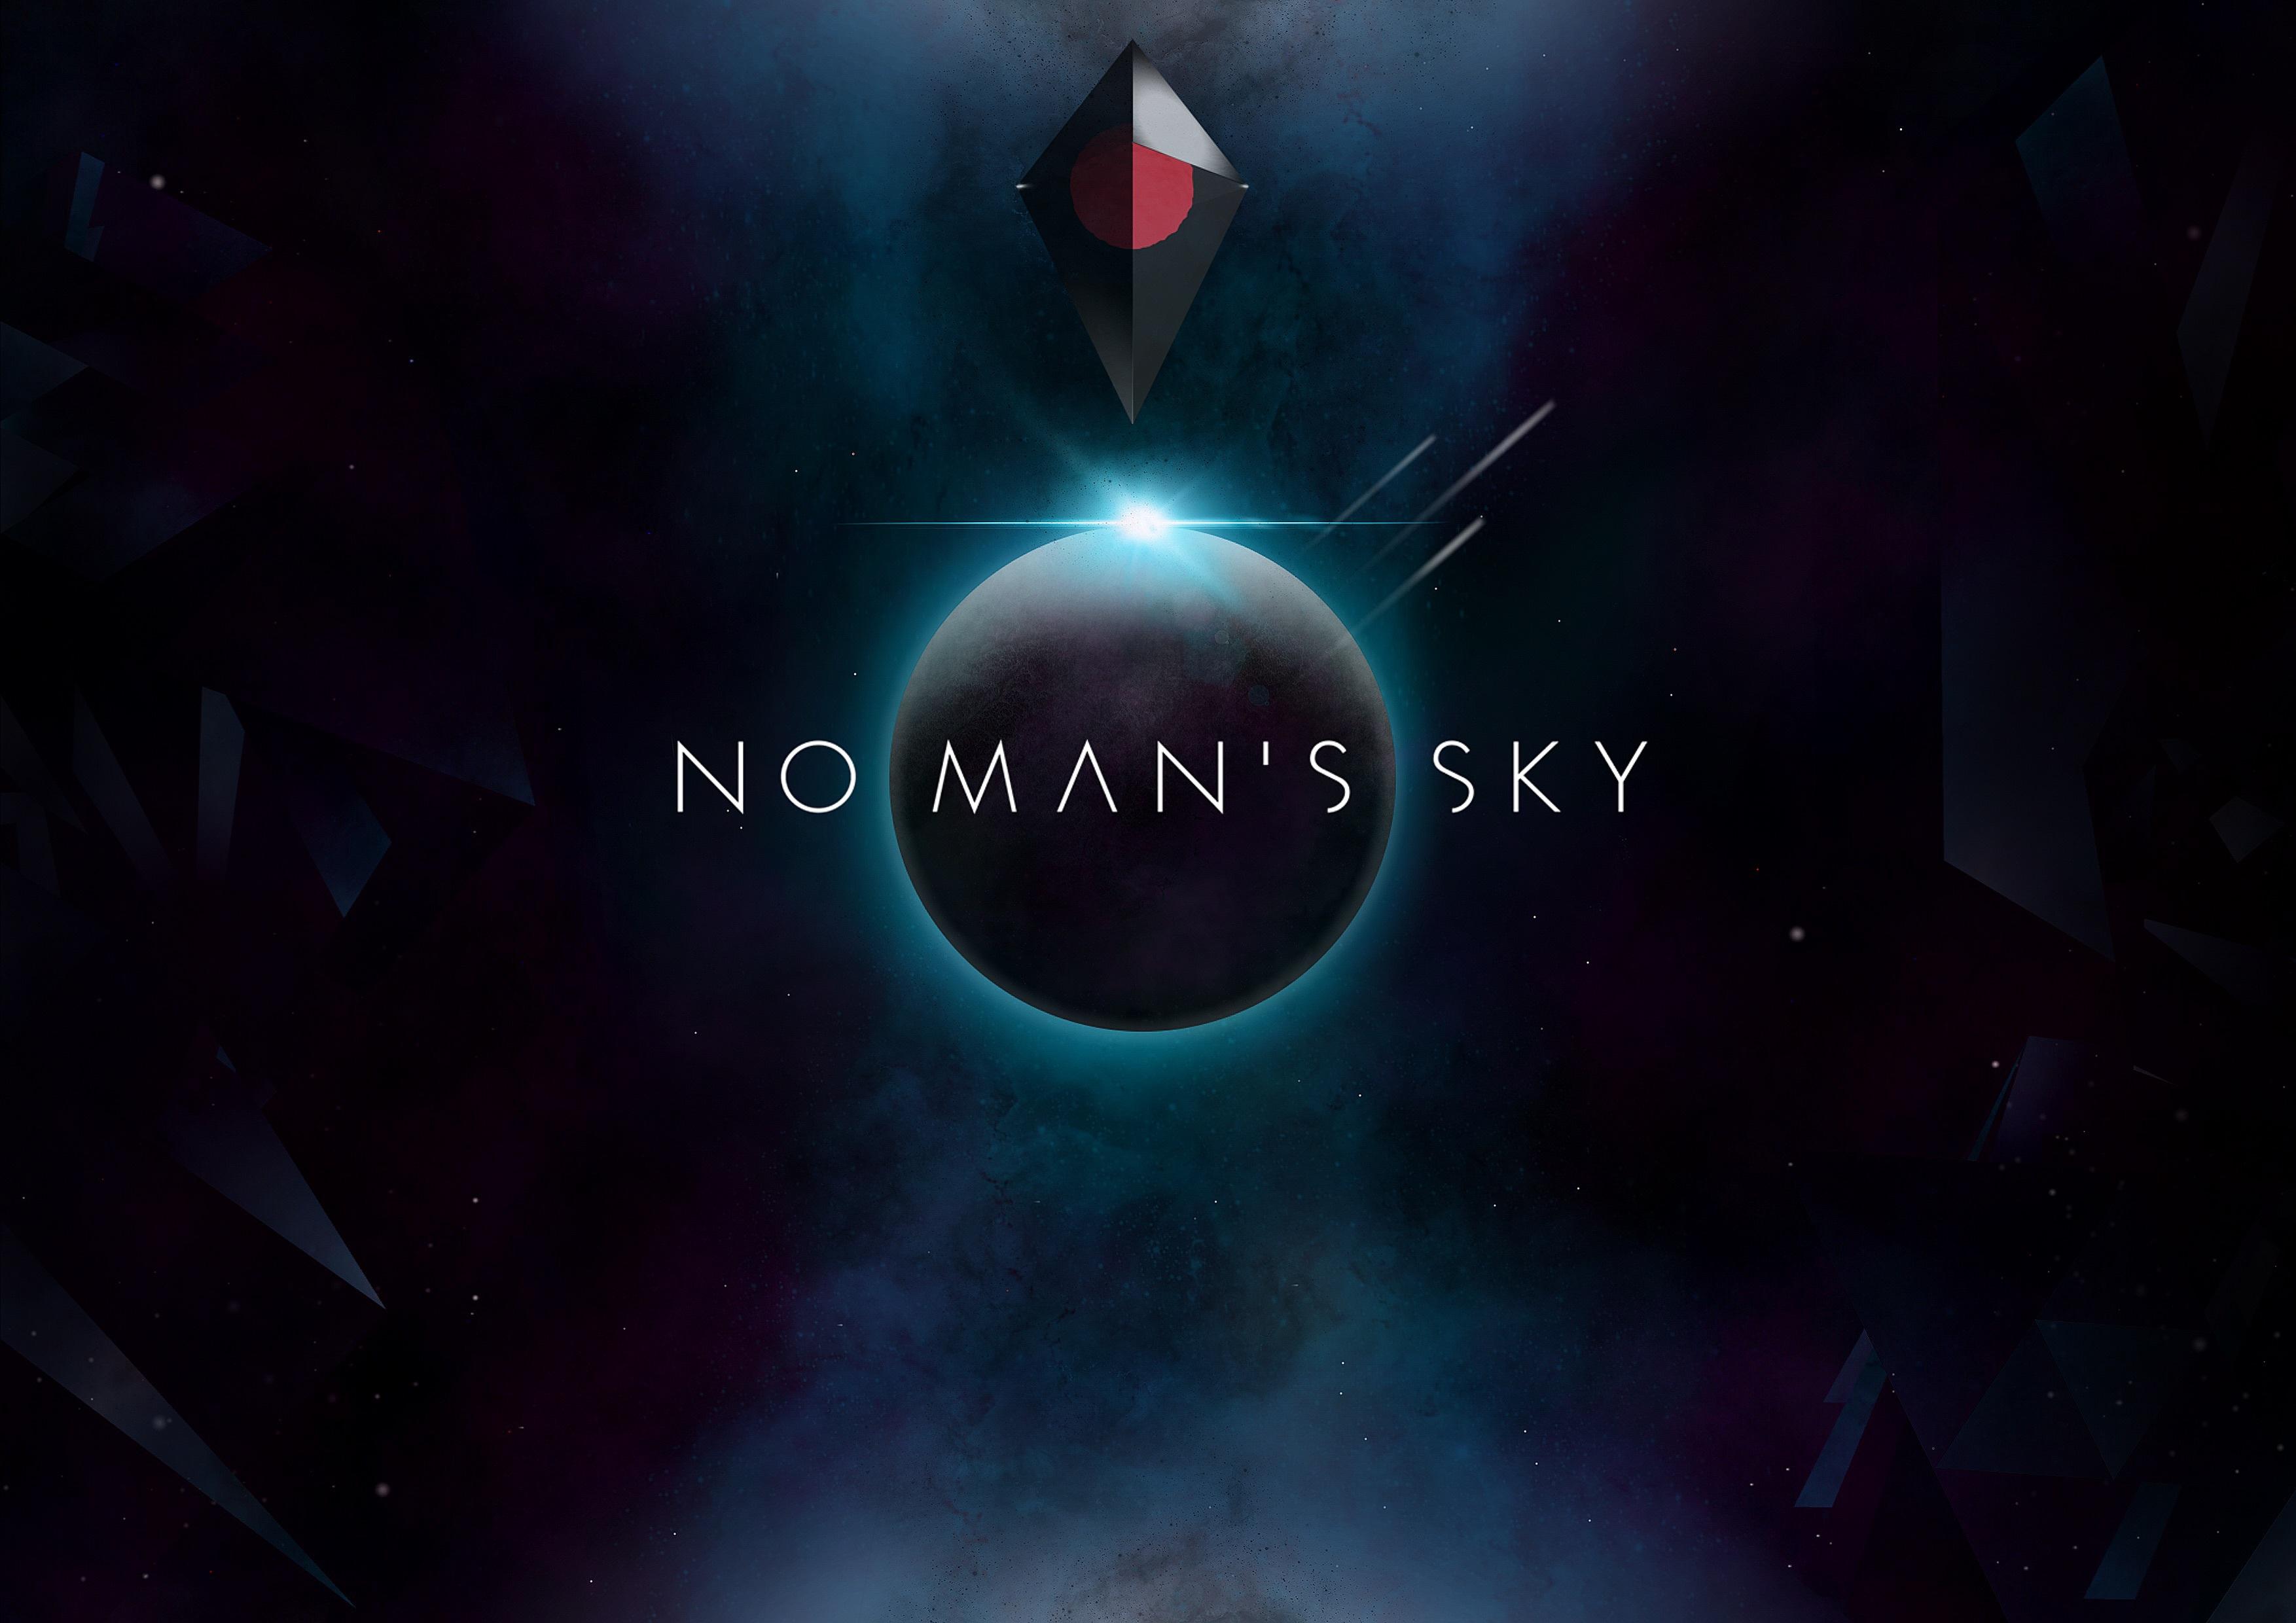 No Man's Sky Desktop Wallpaper